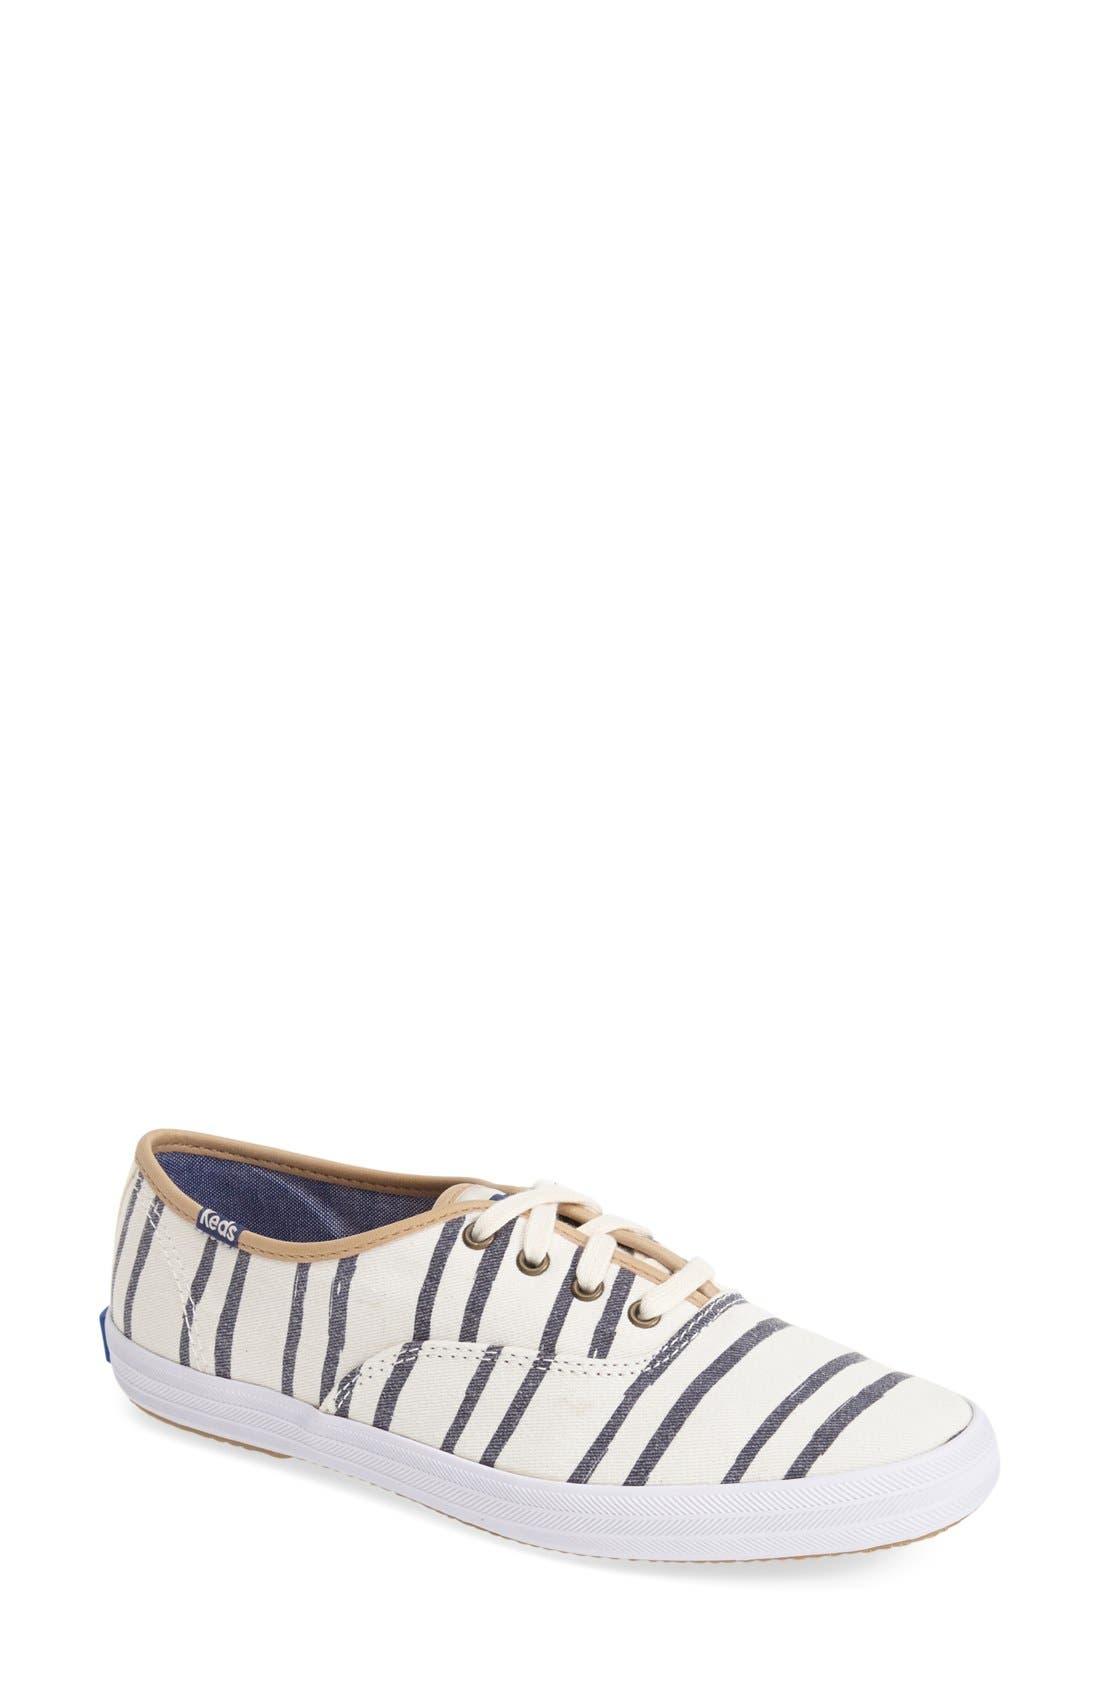 Alternate Image 1 Selected - Keds® 'Champion - Washed Beach Stripe' Sneaker (Women)